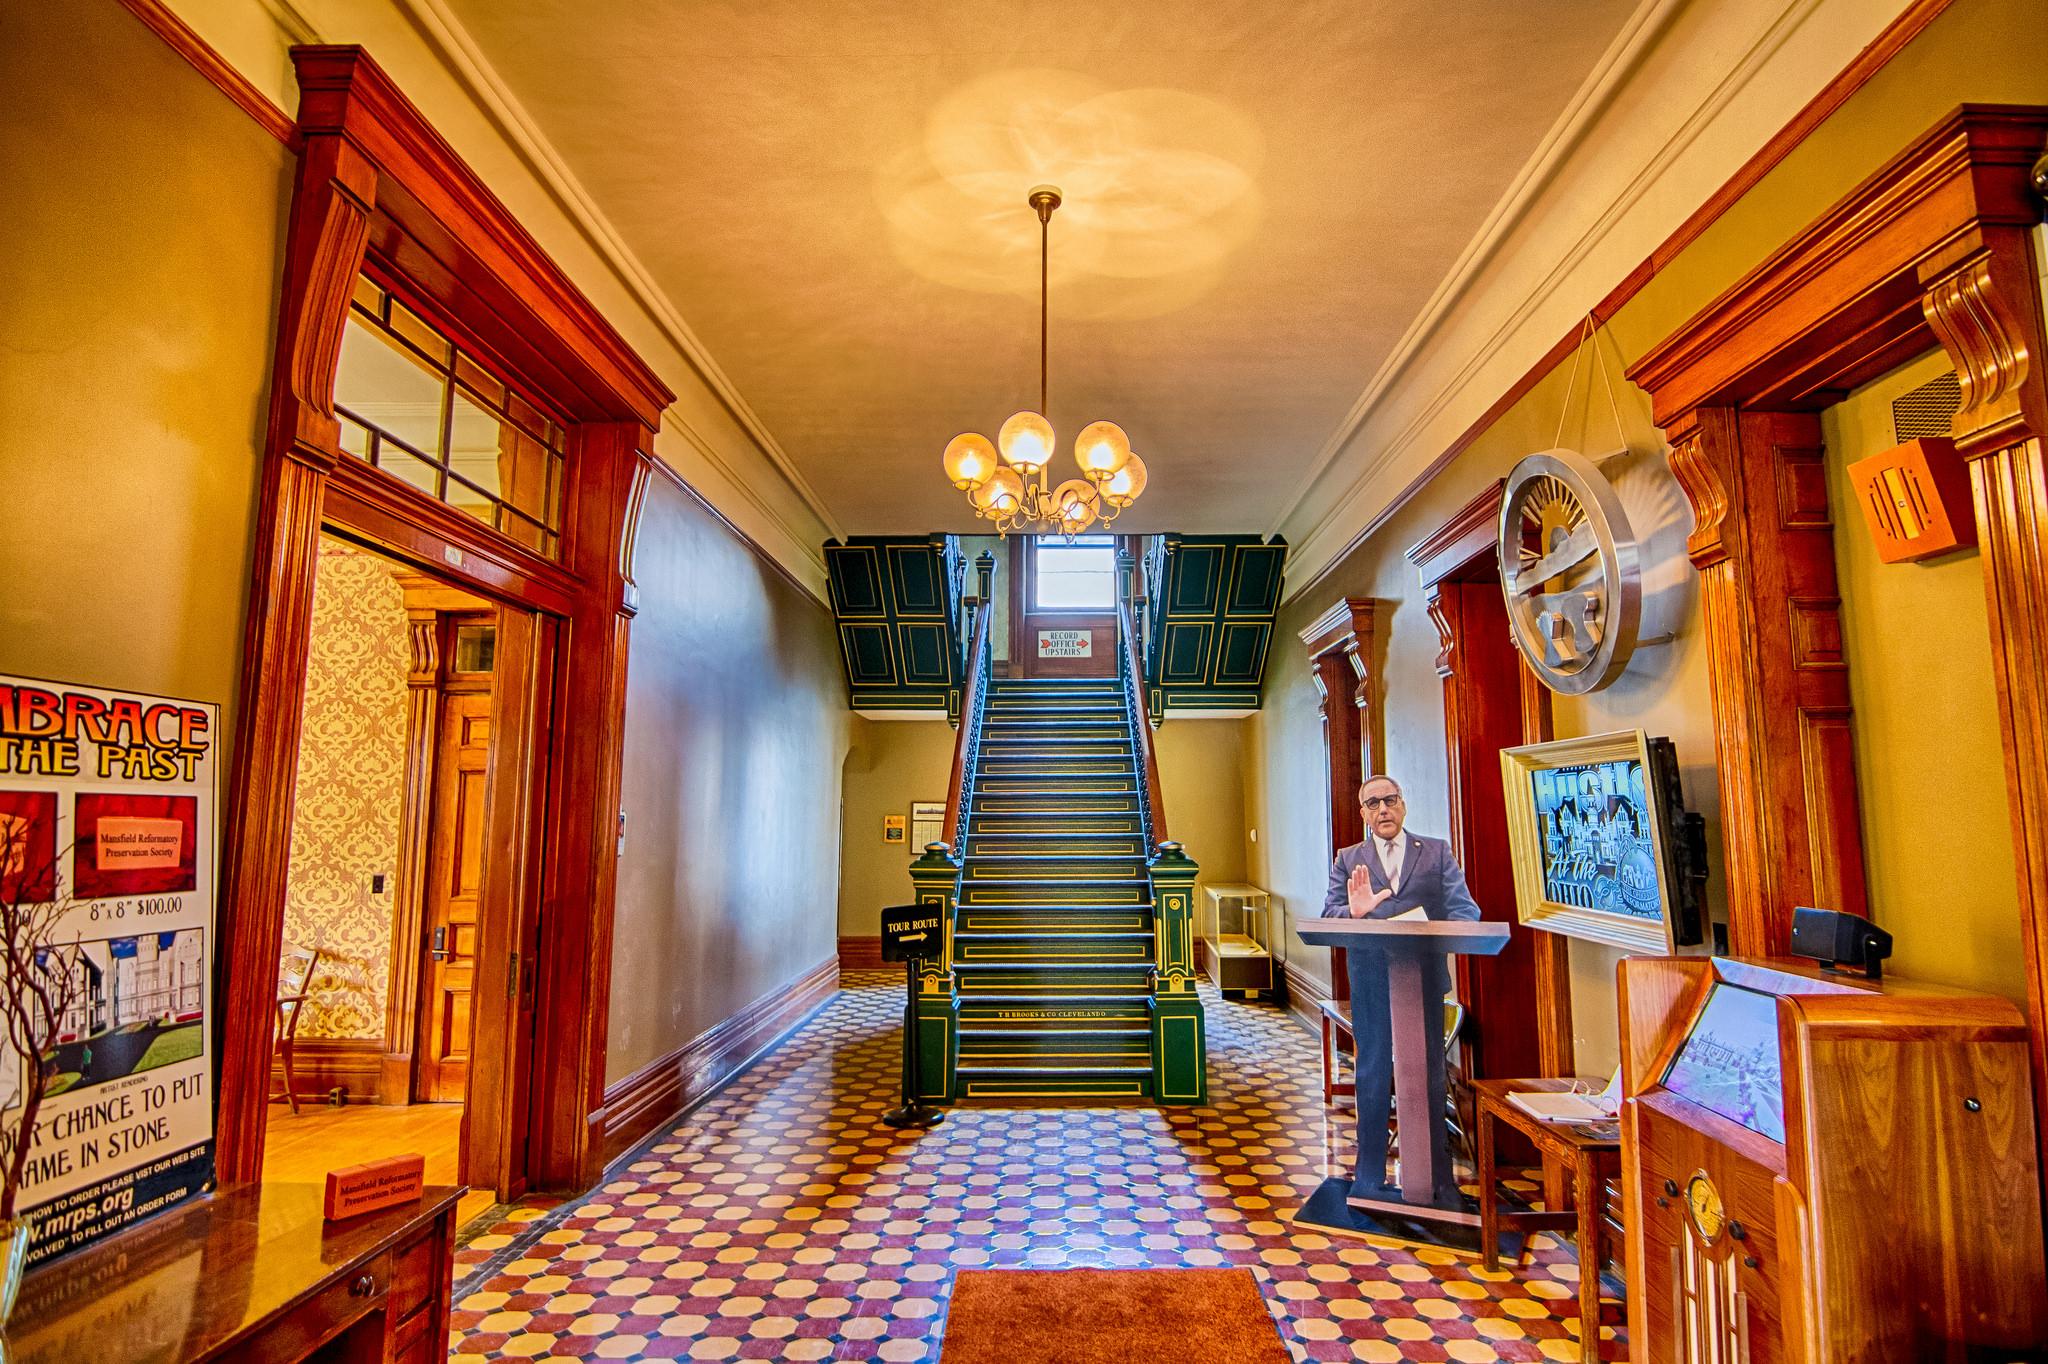 Osr Announces Spring Summer Special Events 1812blockhouse